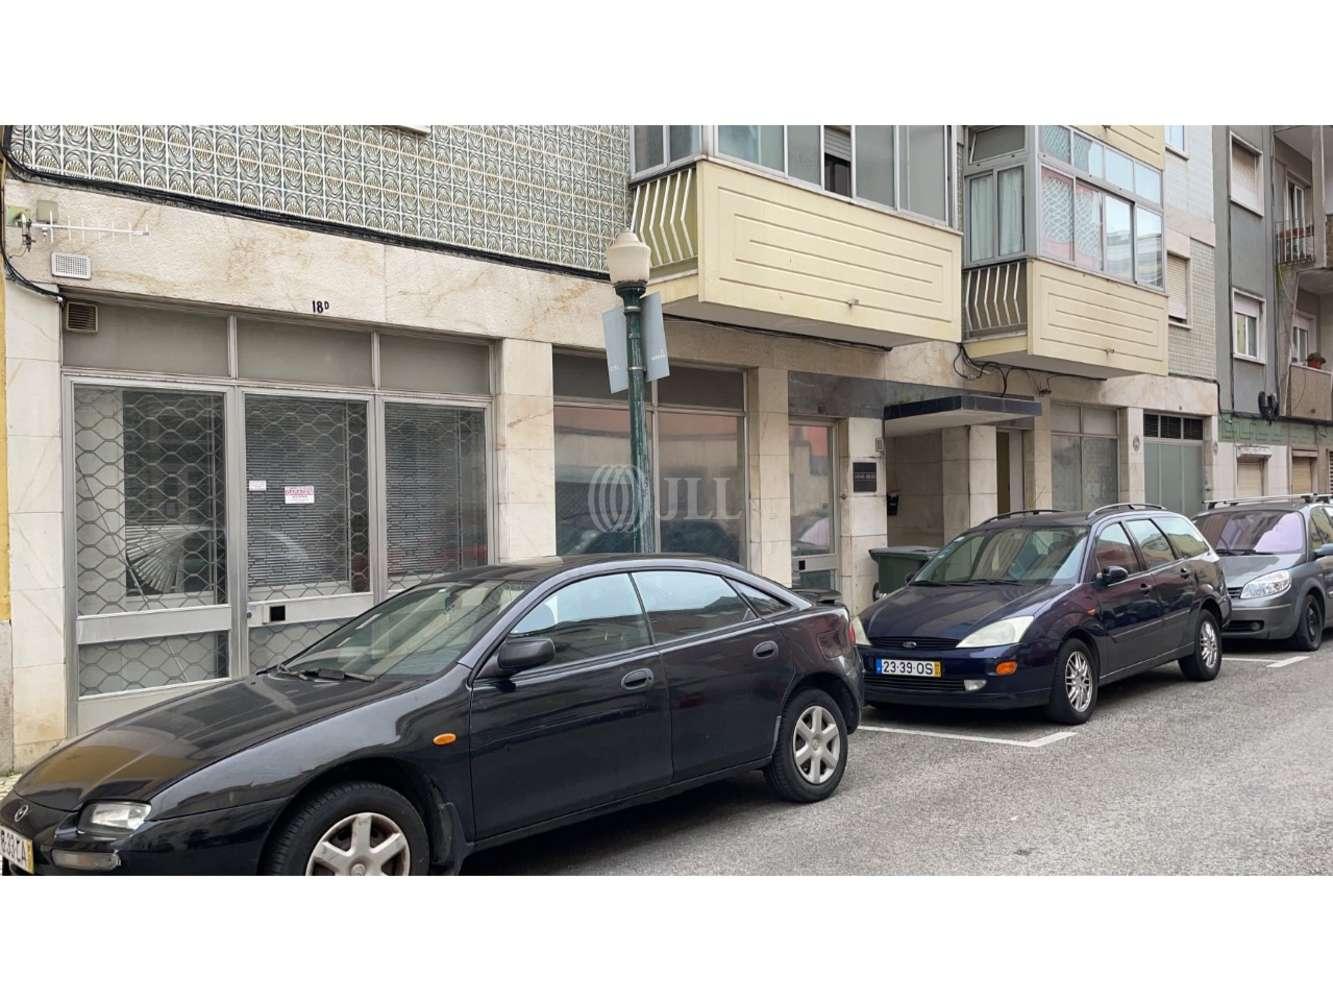 Loja Lisboa,  - Loja localizada na Rua Luis Derouet 18